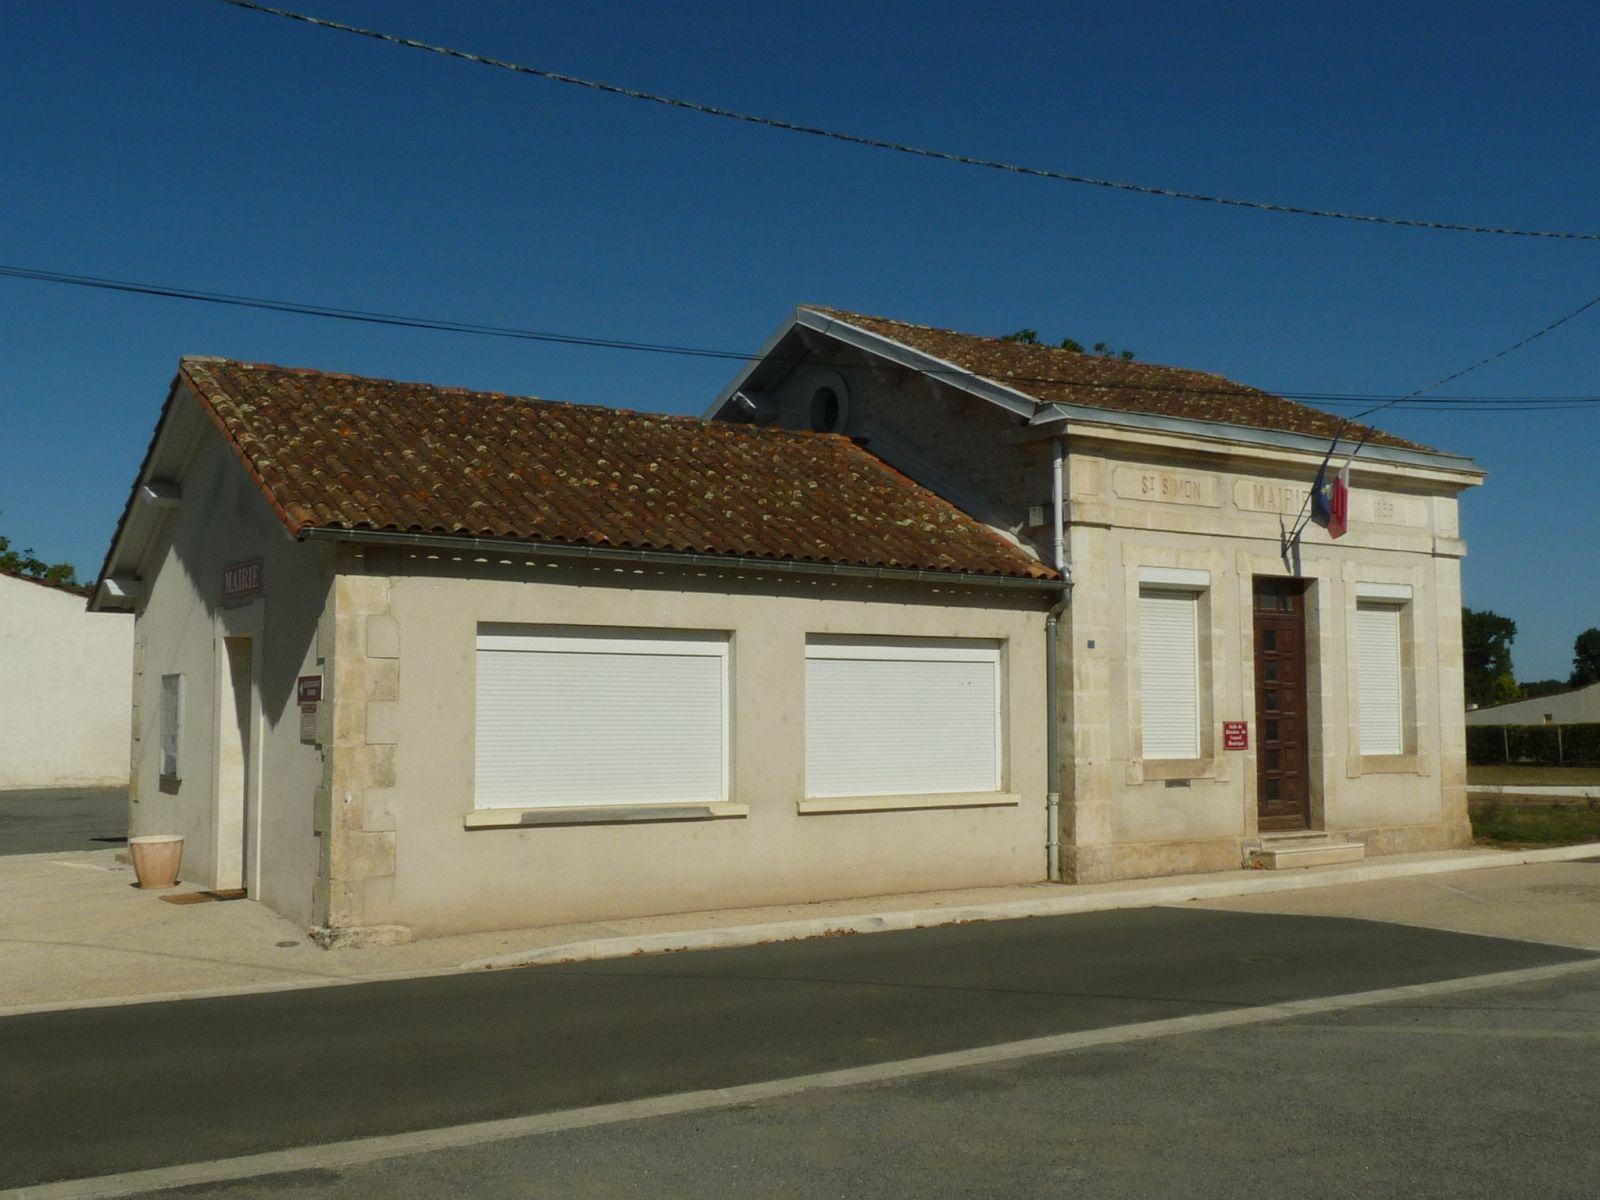 Saint-Simon-de-Pellouaille